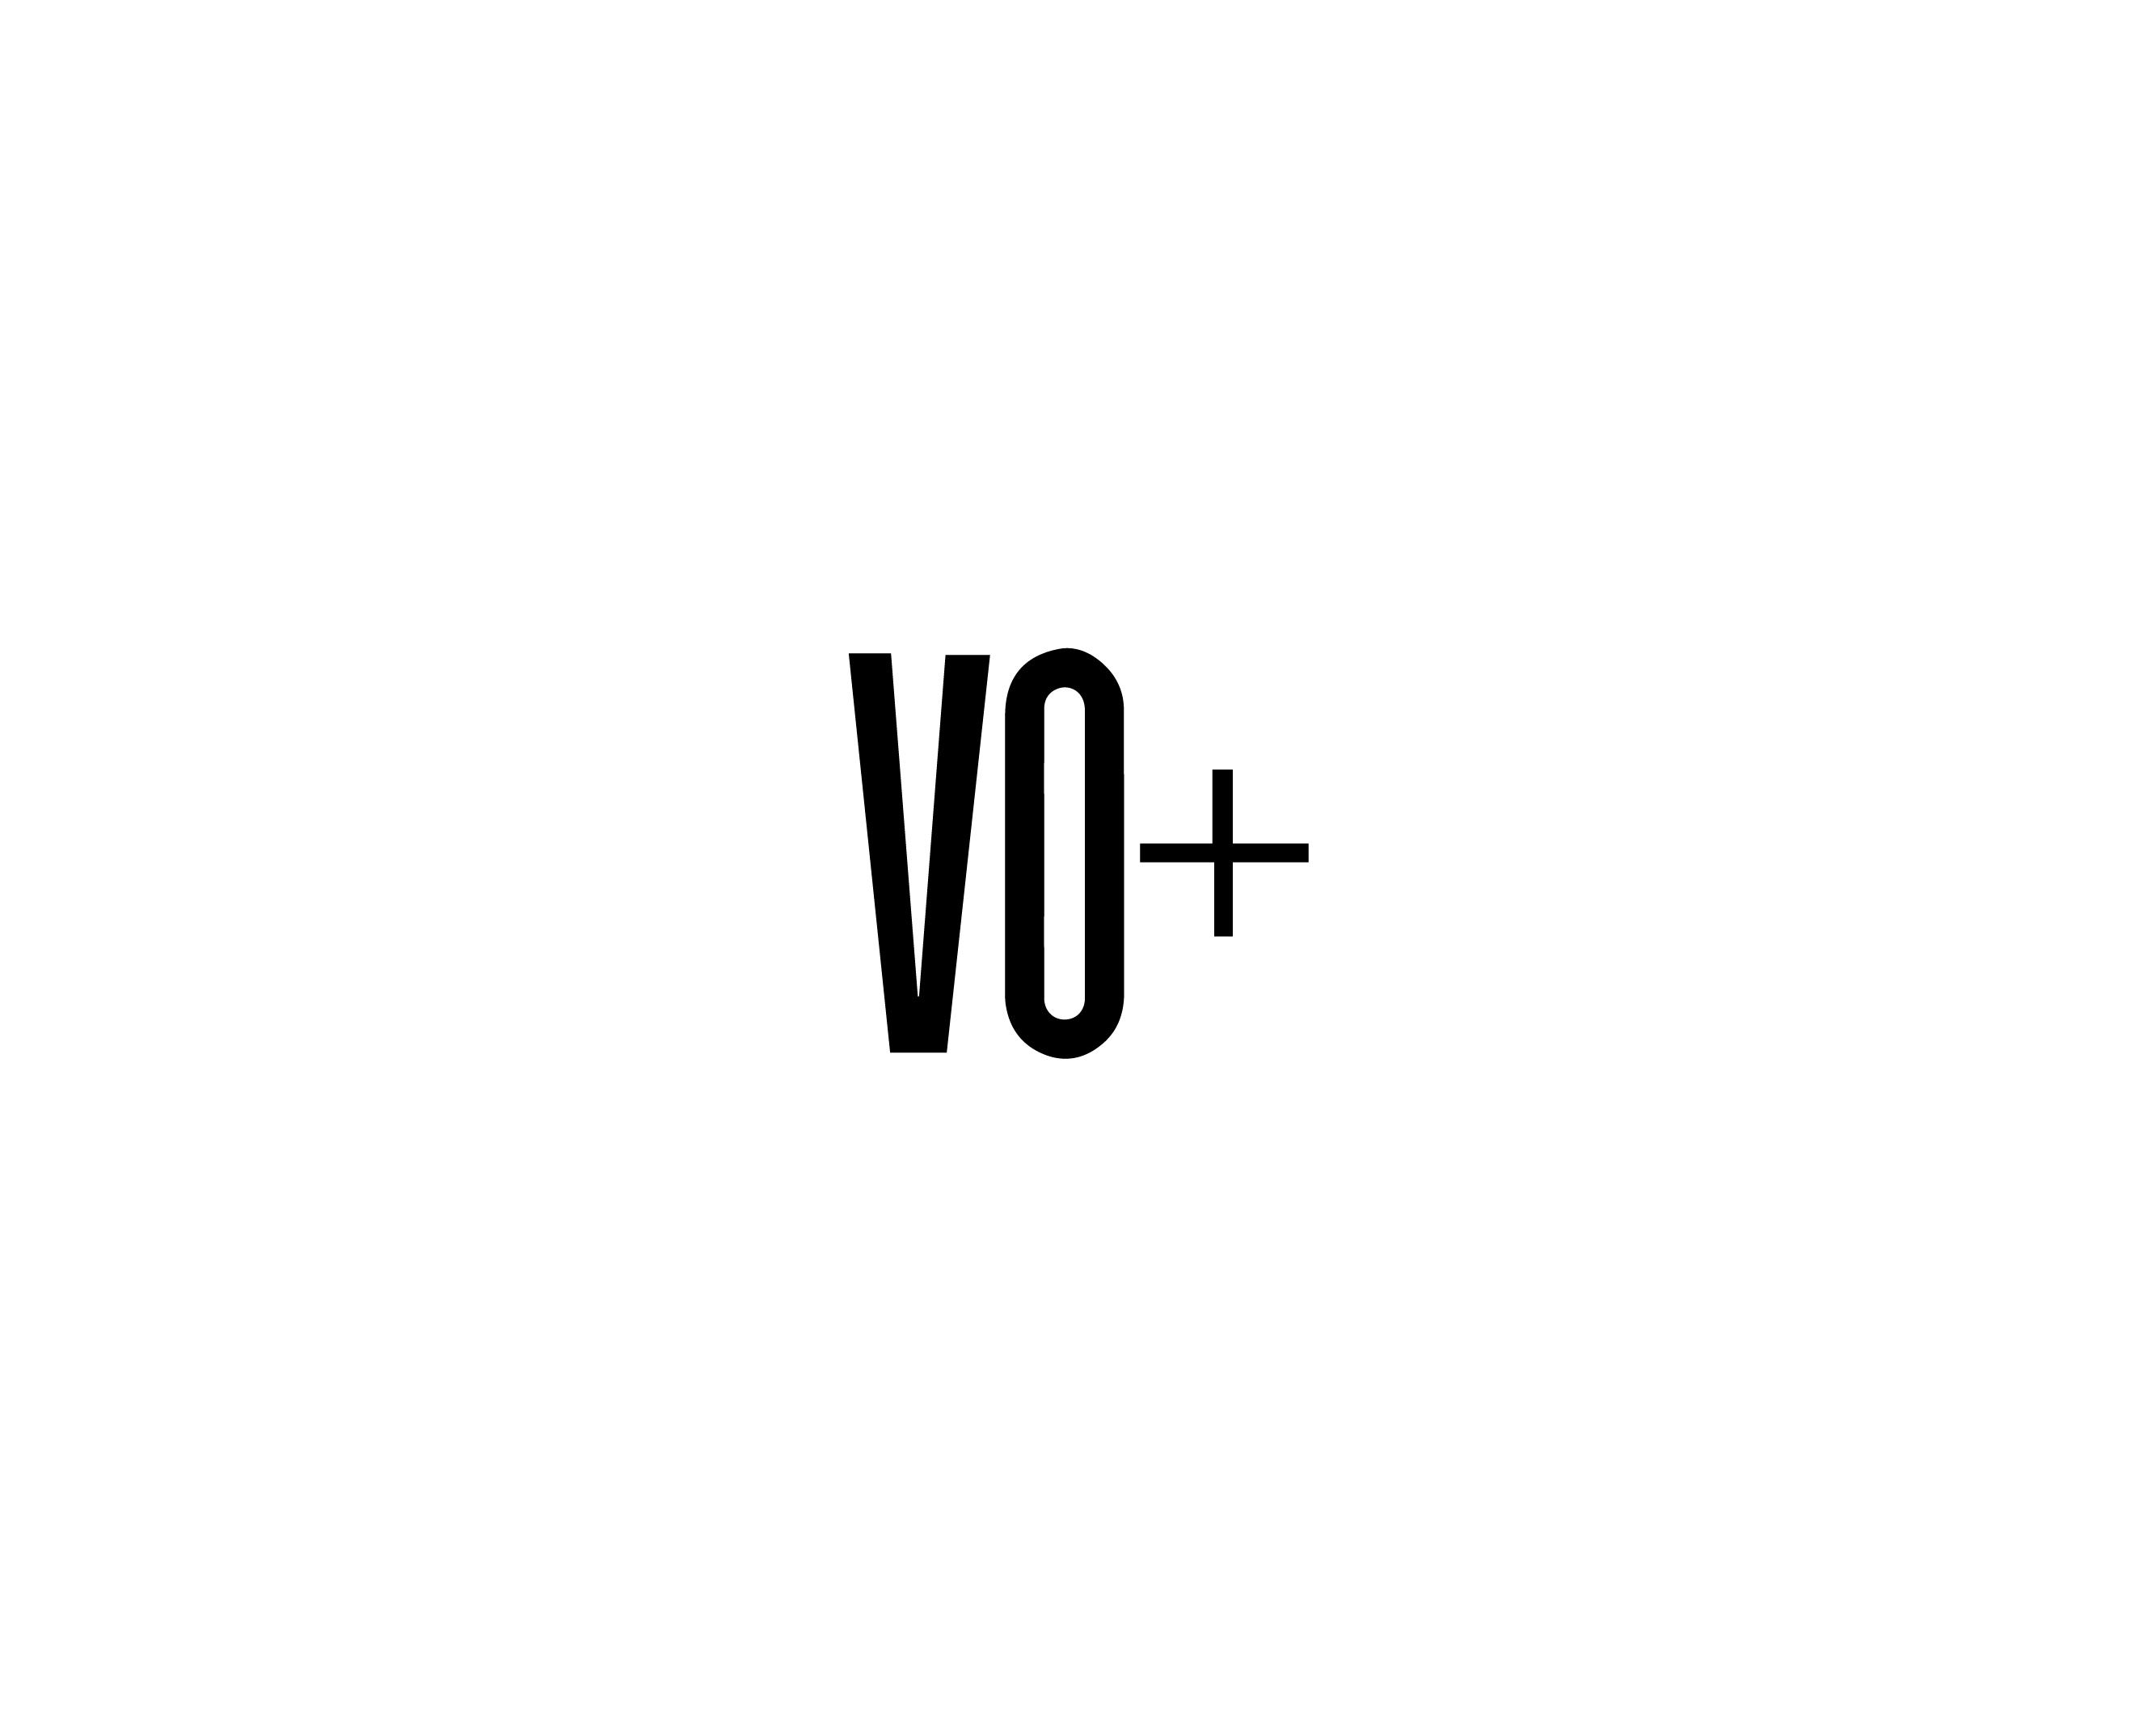 vo-plus-logo_Tavola disegno 1